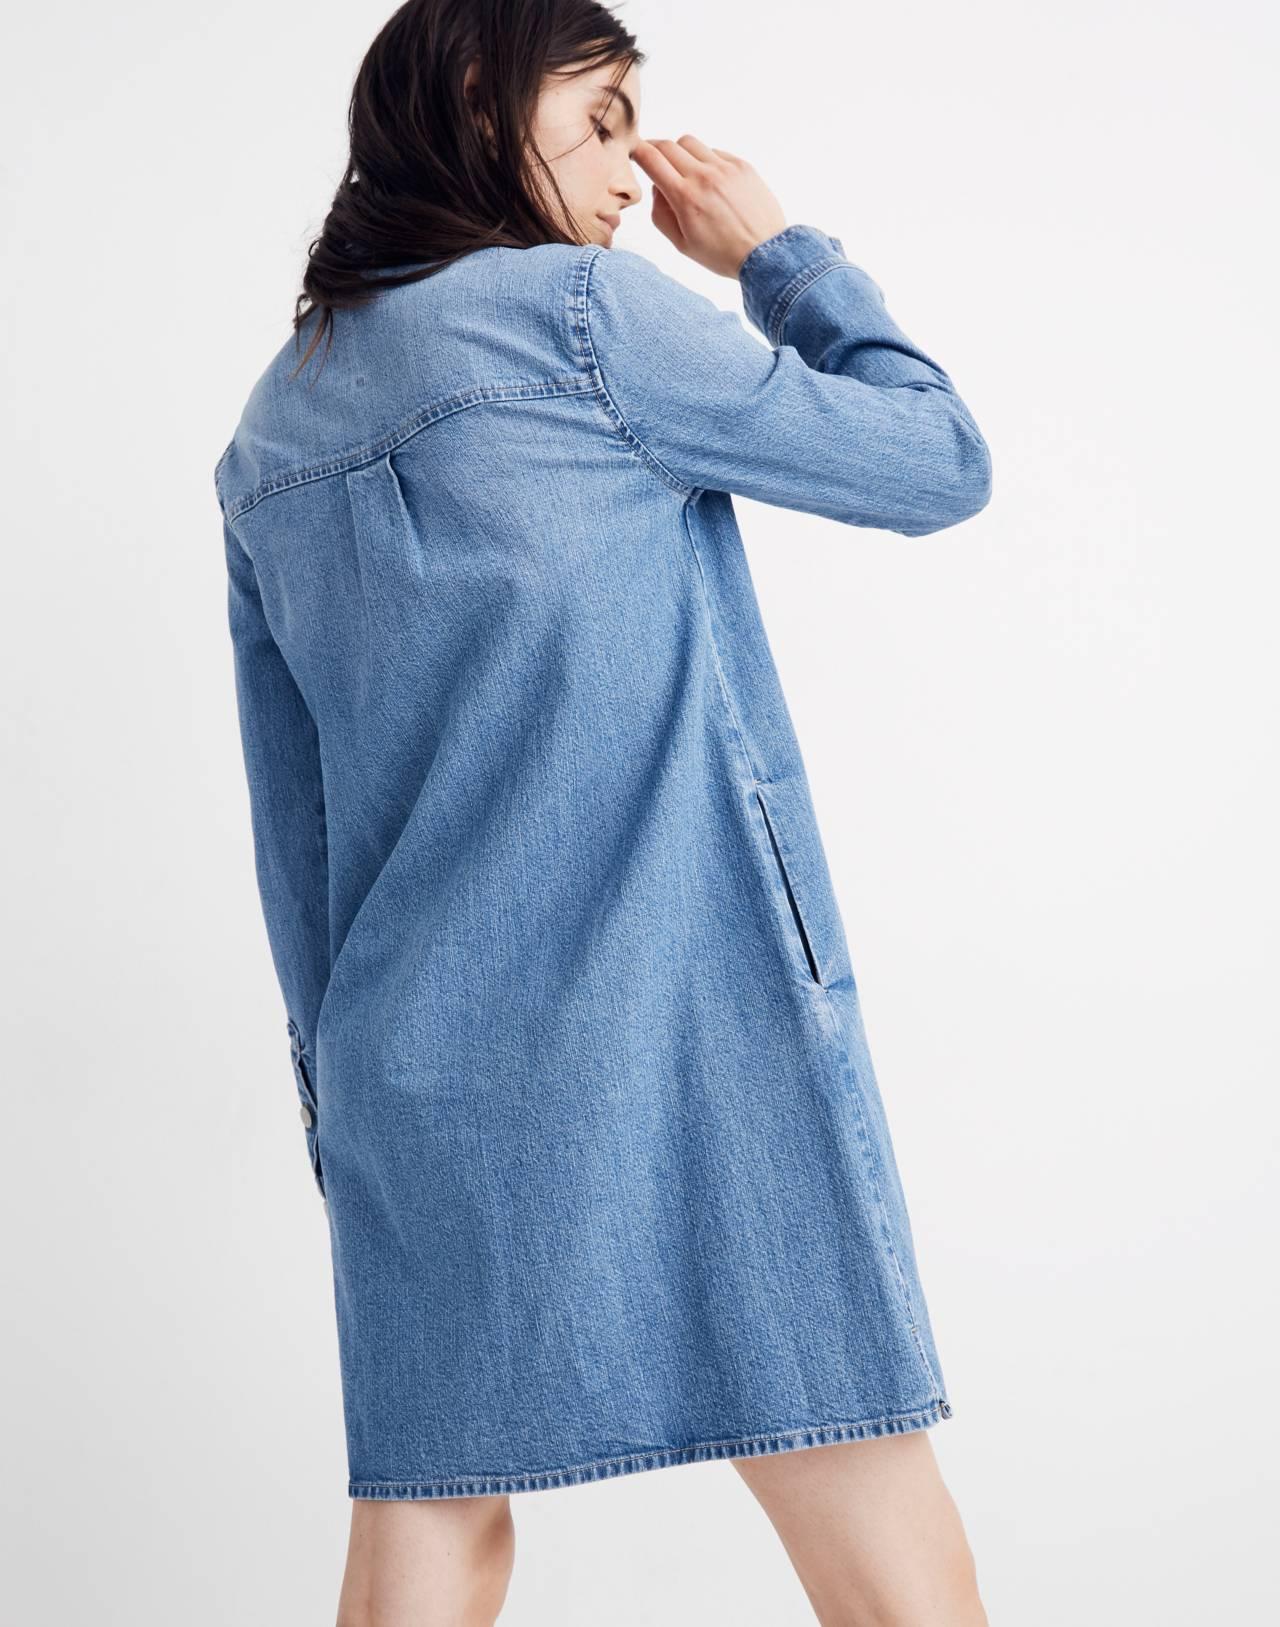 Denim Zip-Front Shirtdress in lenore wash image 3